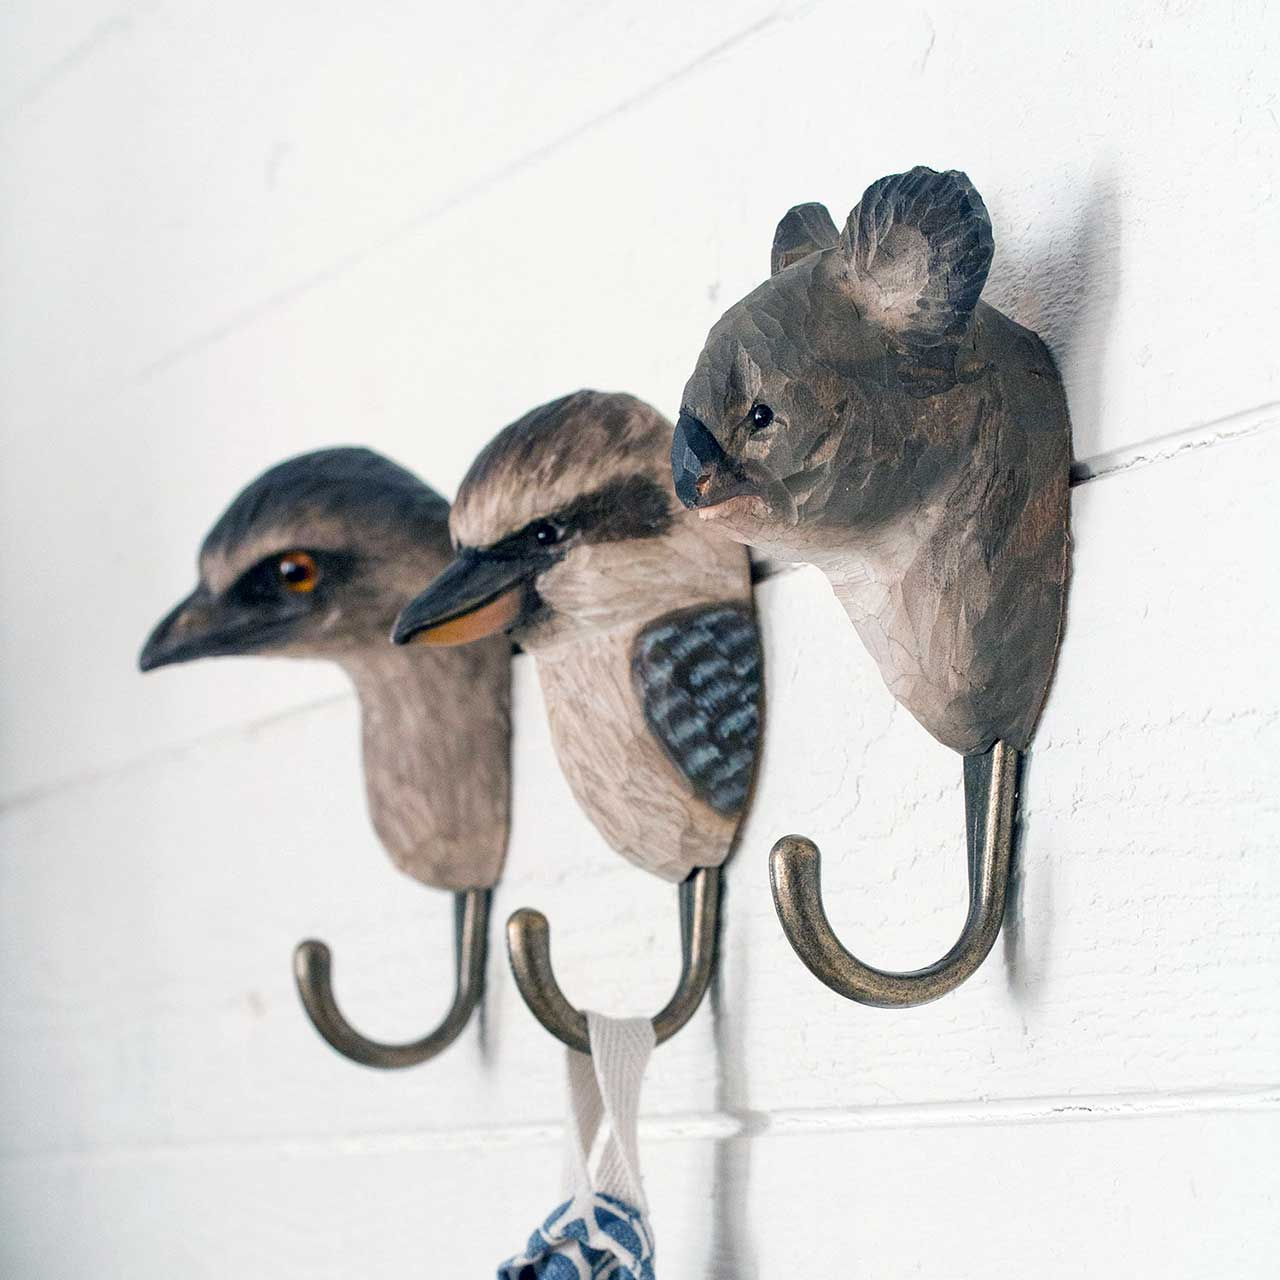 WILDLIFE GARDEN Wall Hooks (only kookaburra hook incl. in offer)   the design gift shop